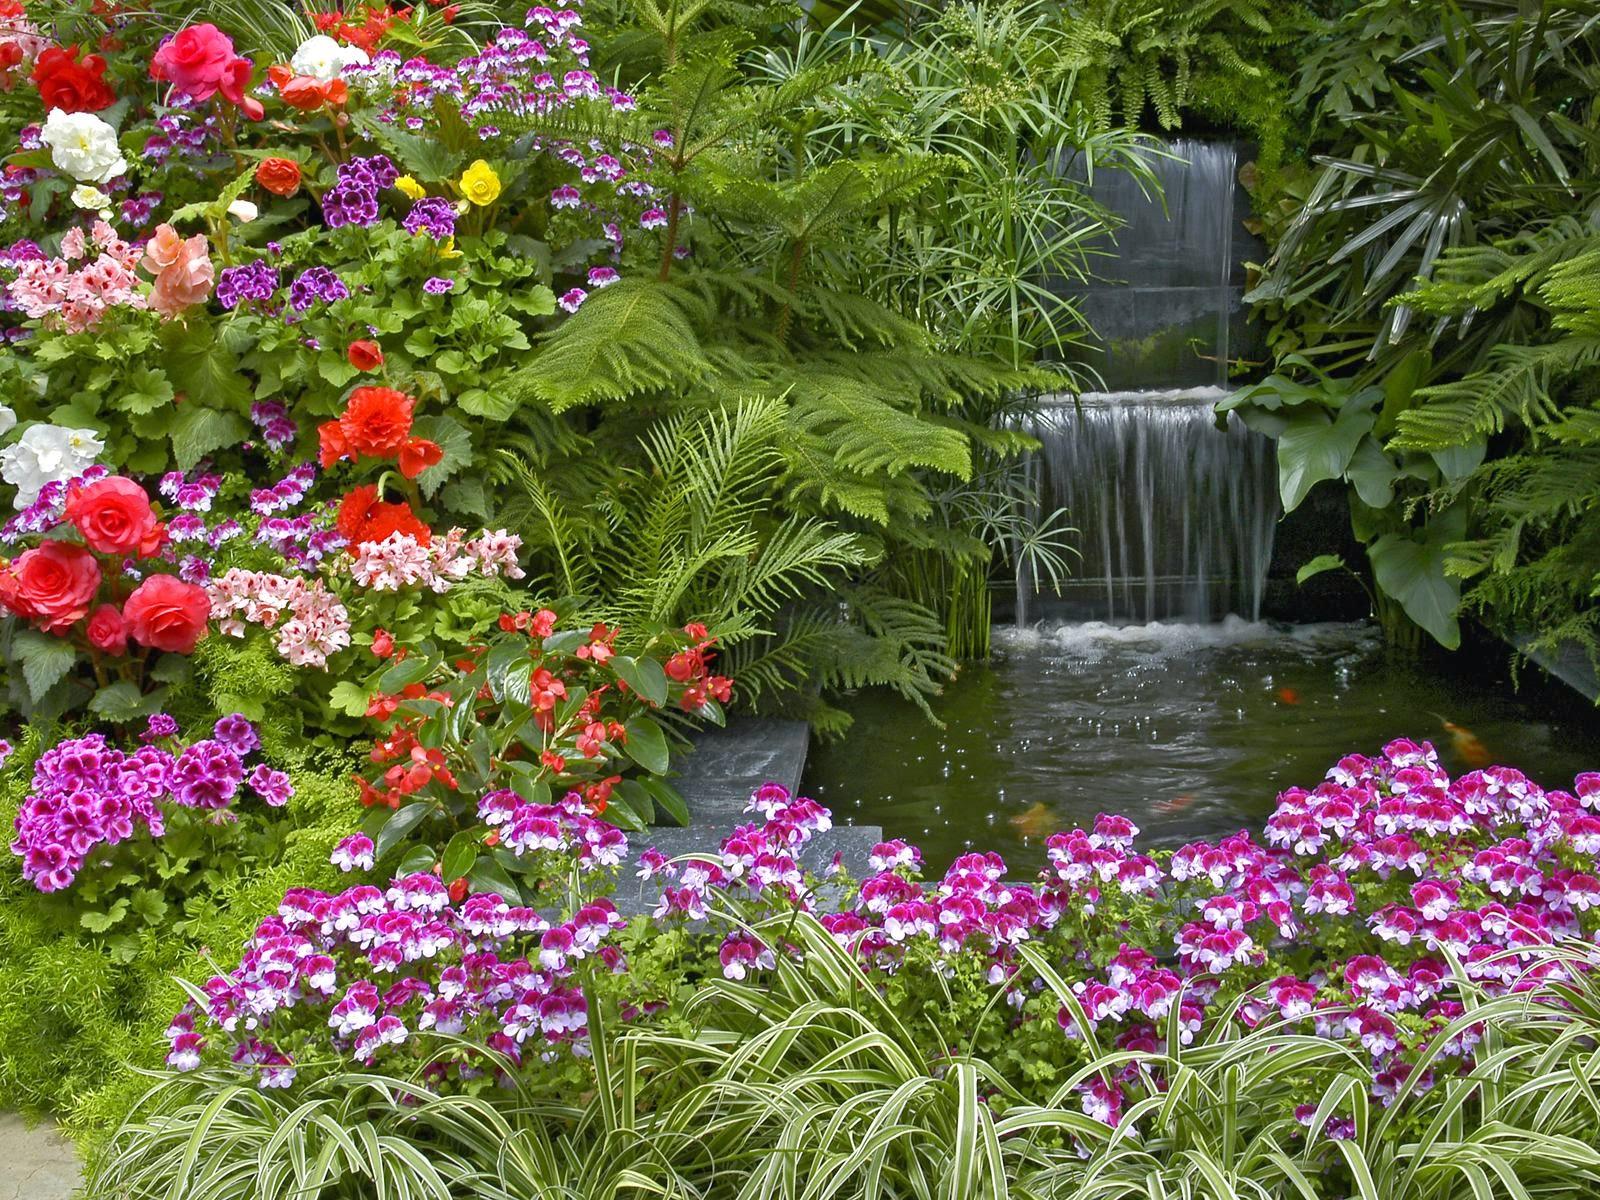 HD Flower Garden Wallpaper|http://refreshrose.blogspot.com/